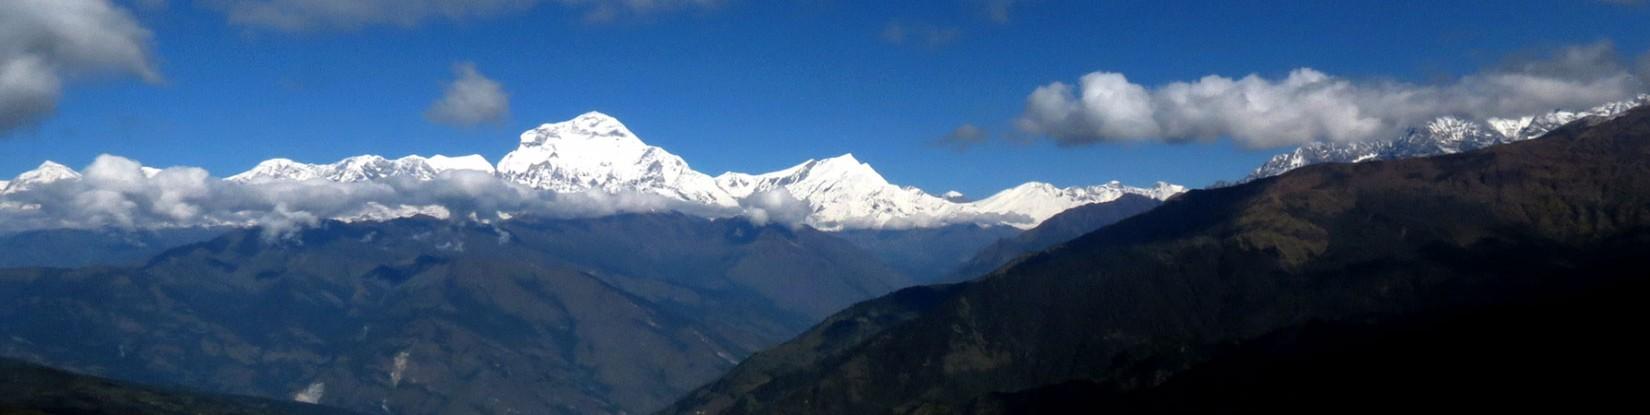 Dhaulagiri Range seen from Poon Hill (3120m)